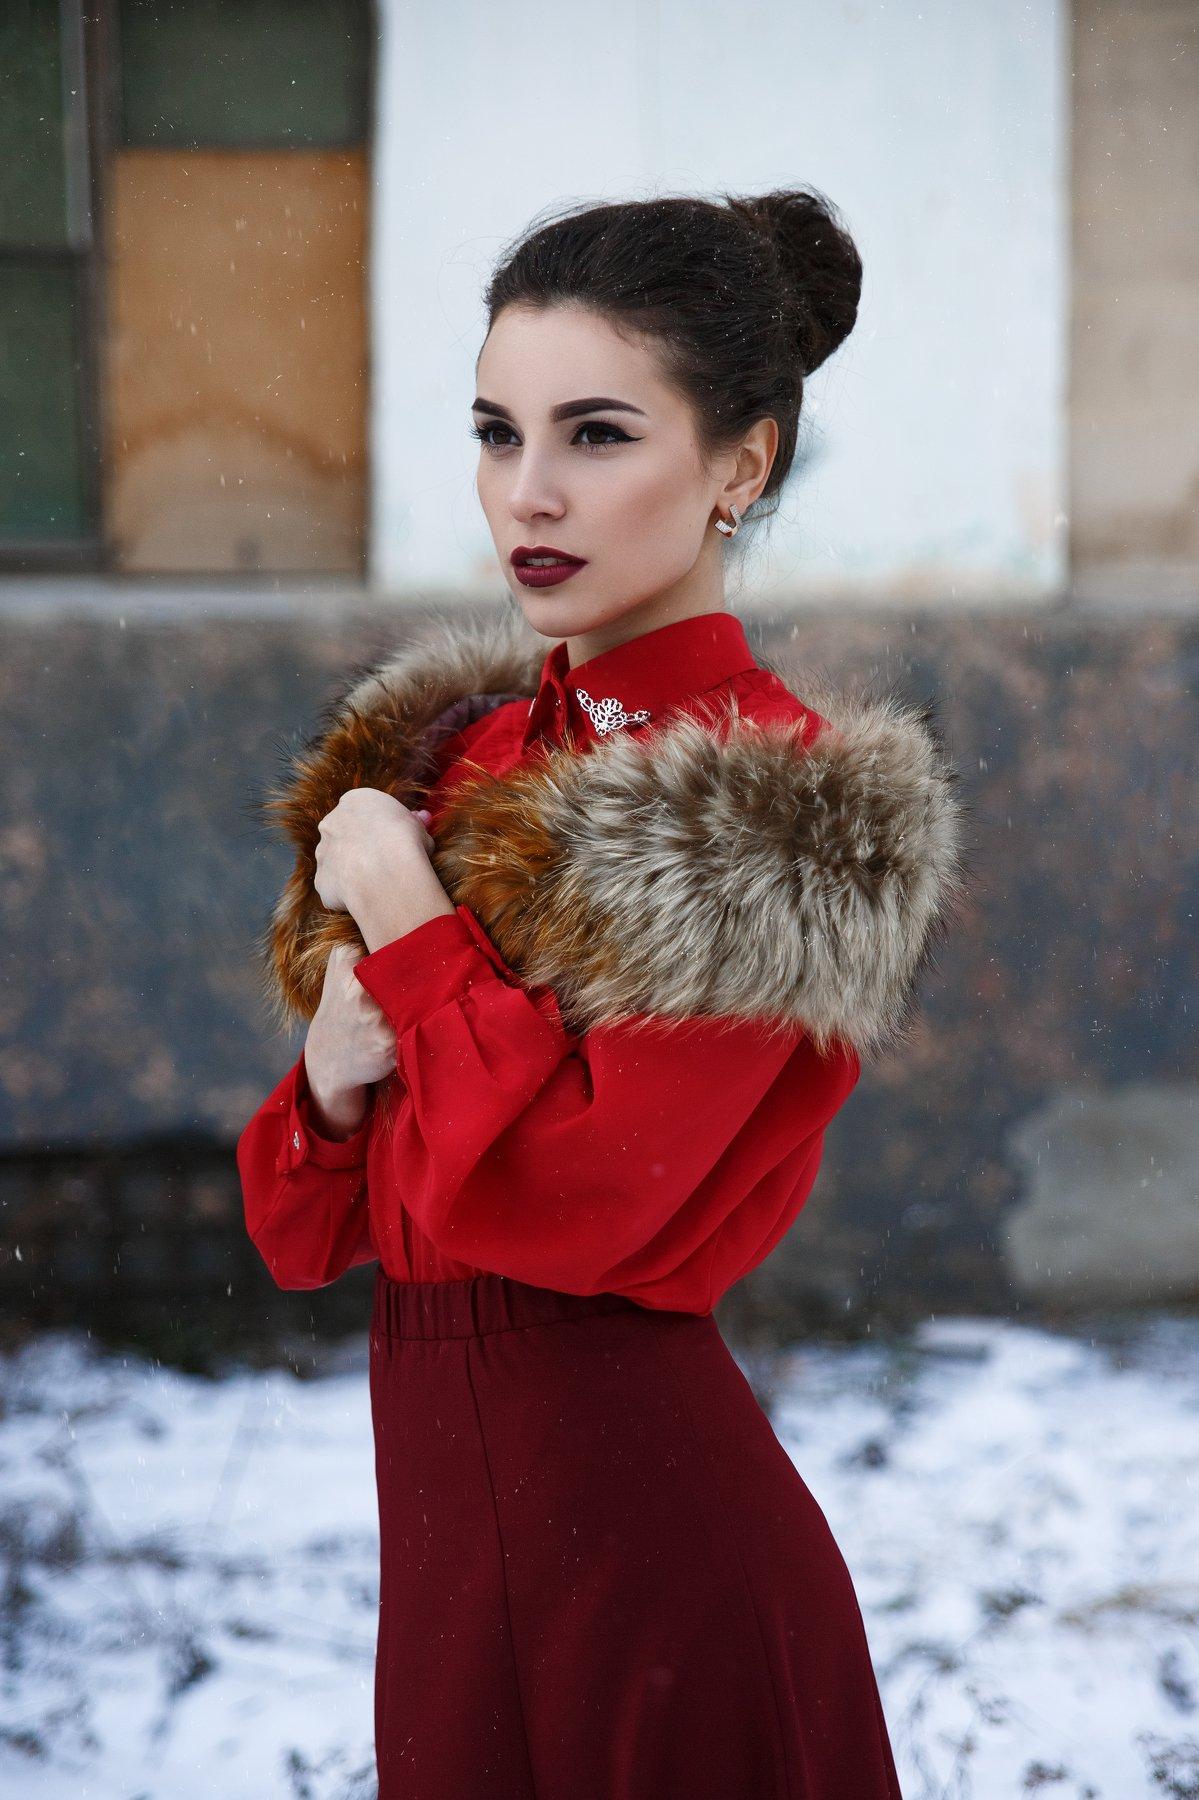 #Иван Бабыдов #Девушка #Леди #Снег, Бабыдов Иван